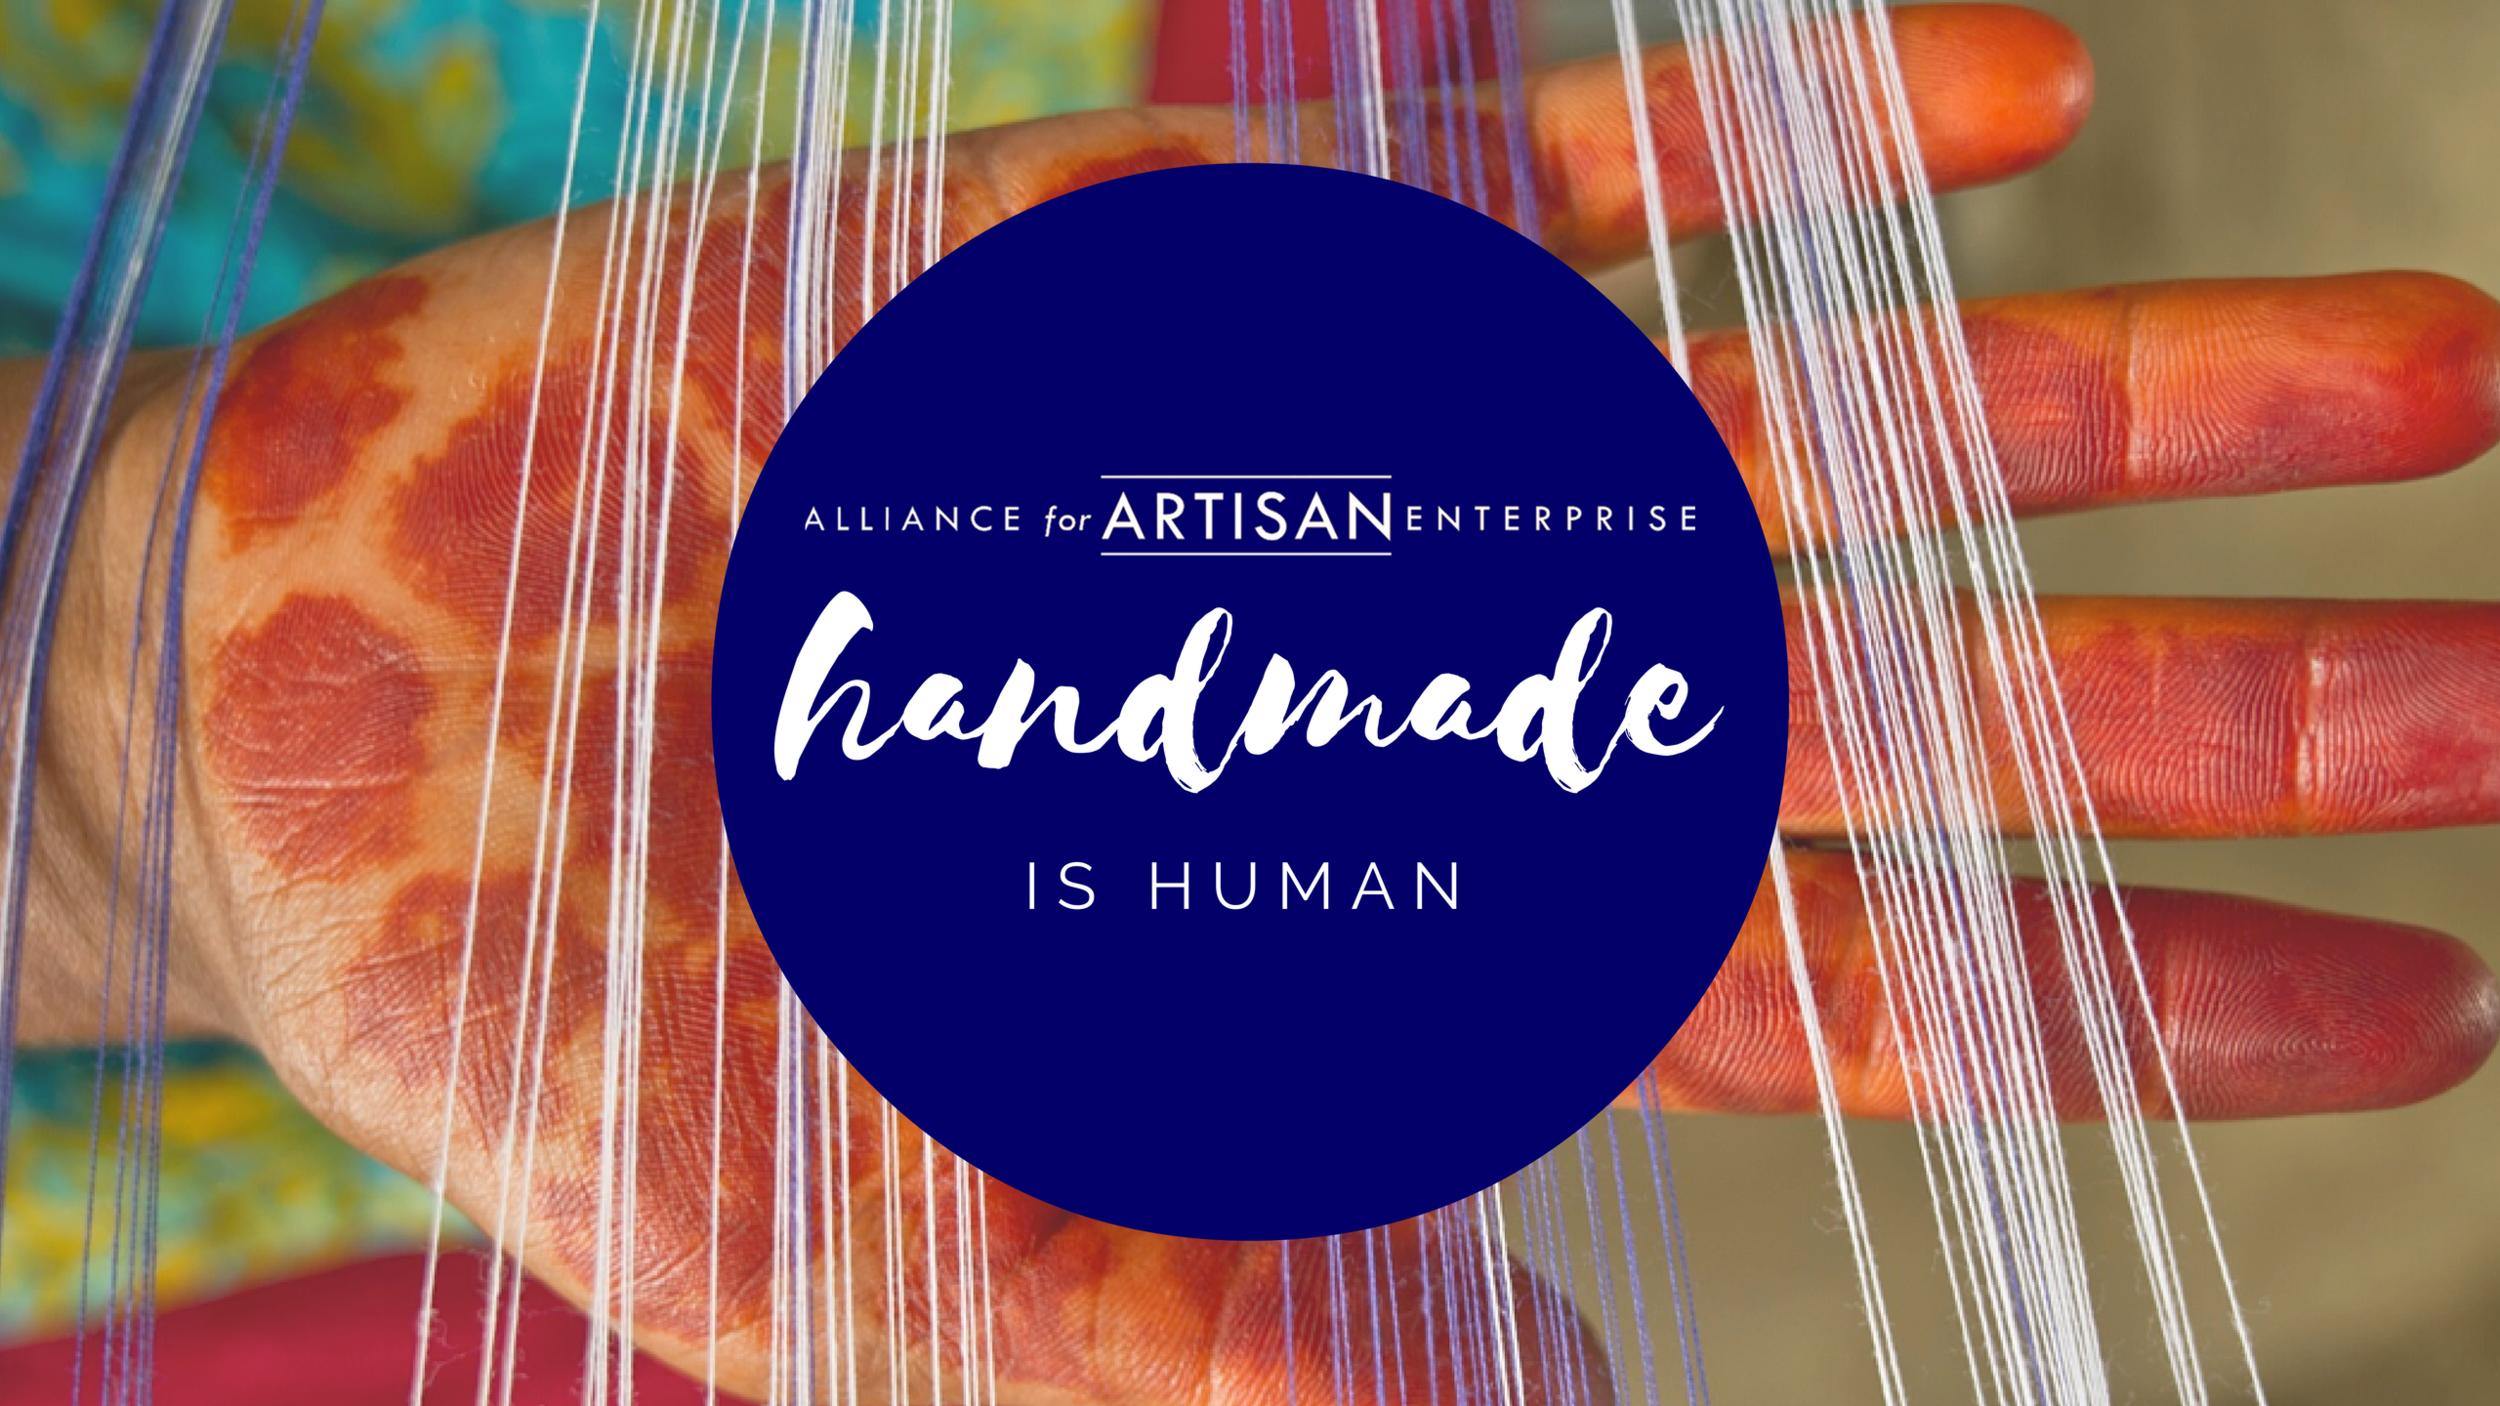 HANDMADE IS HUMAN 2.png